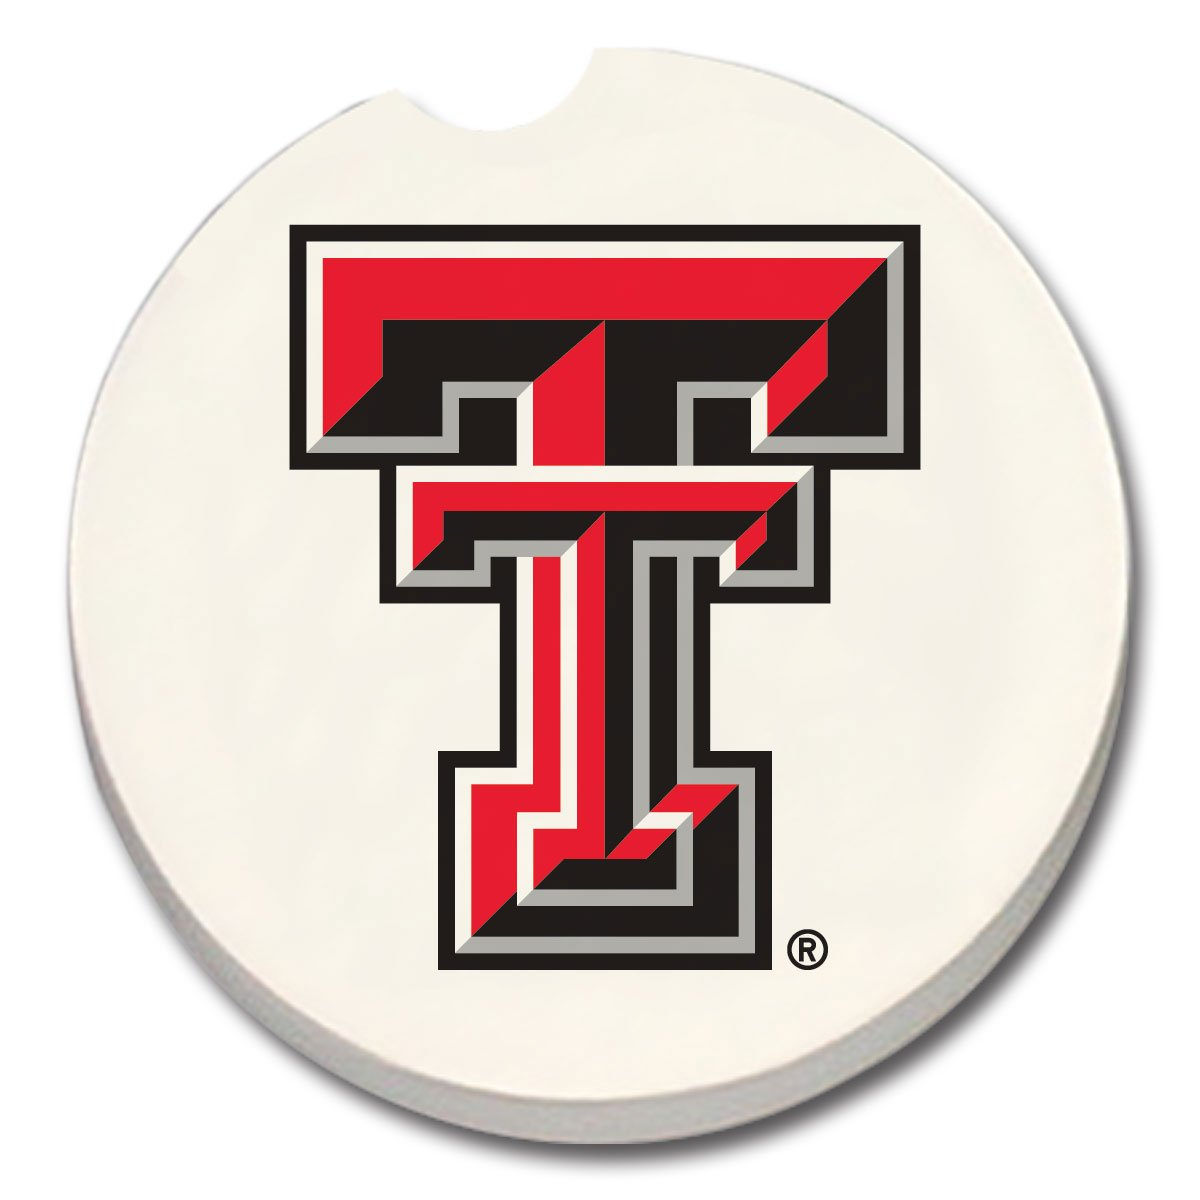 NCAA Texas Tech Red Raiders Absorbent Car Coaster 1 COUNT